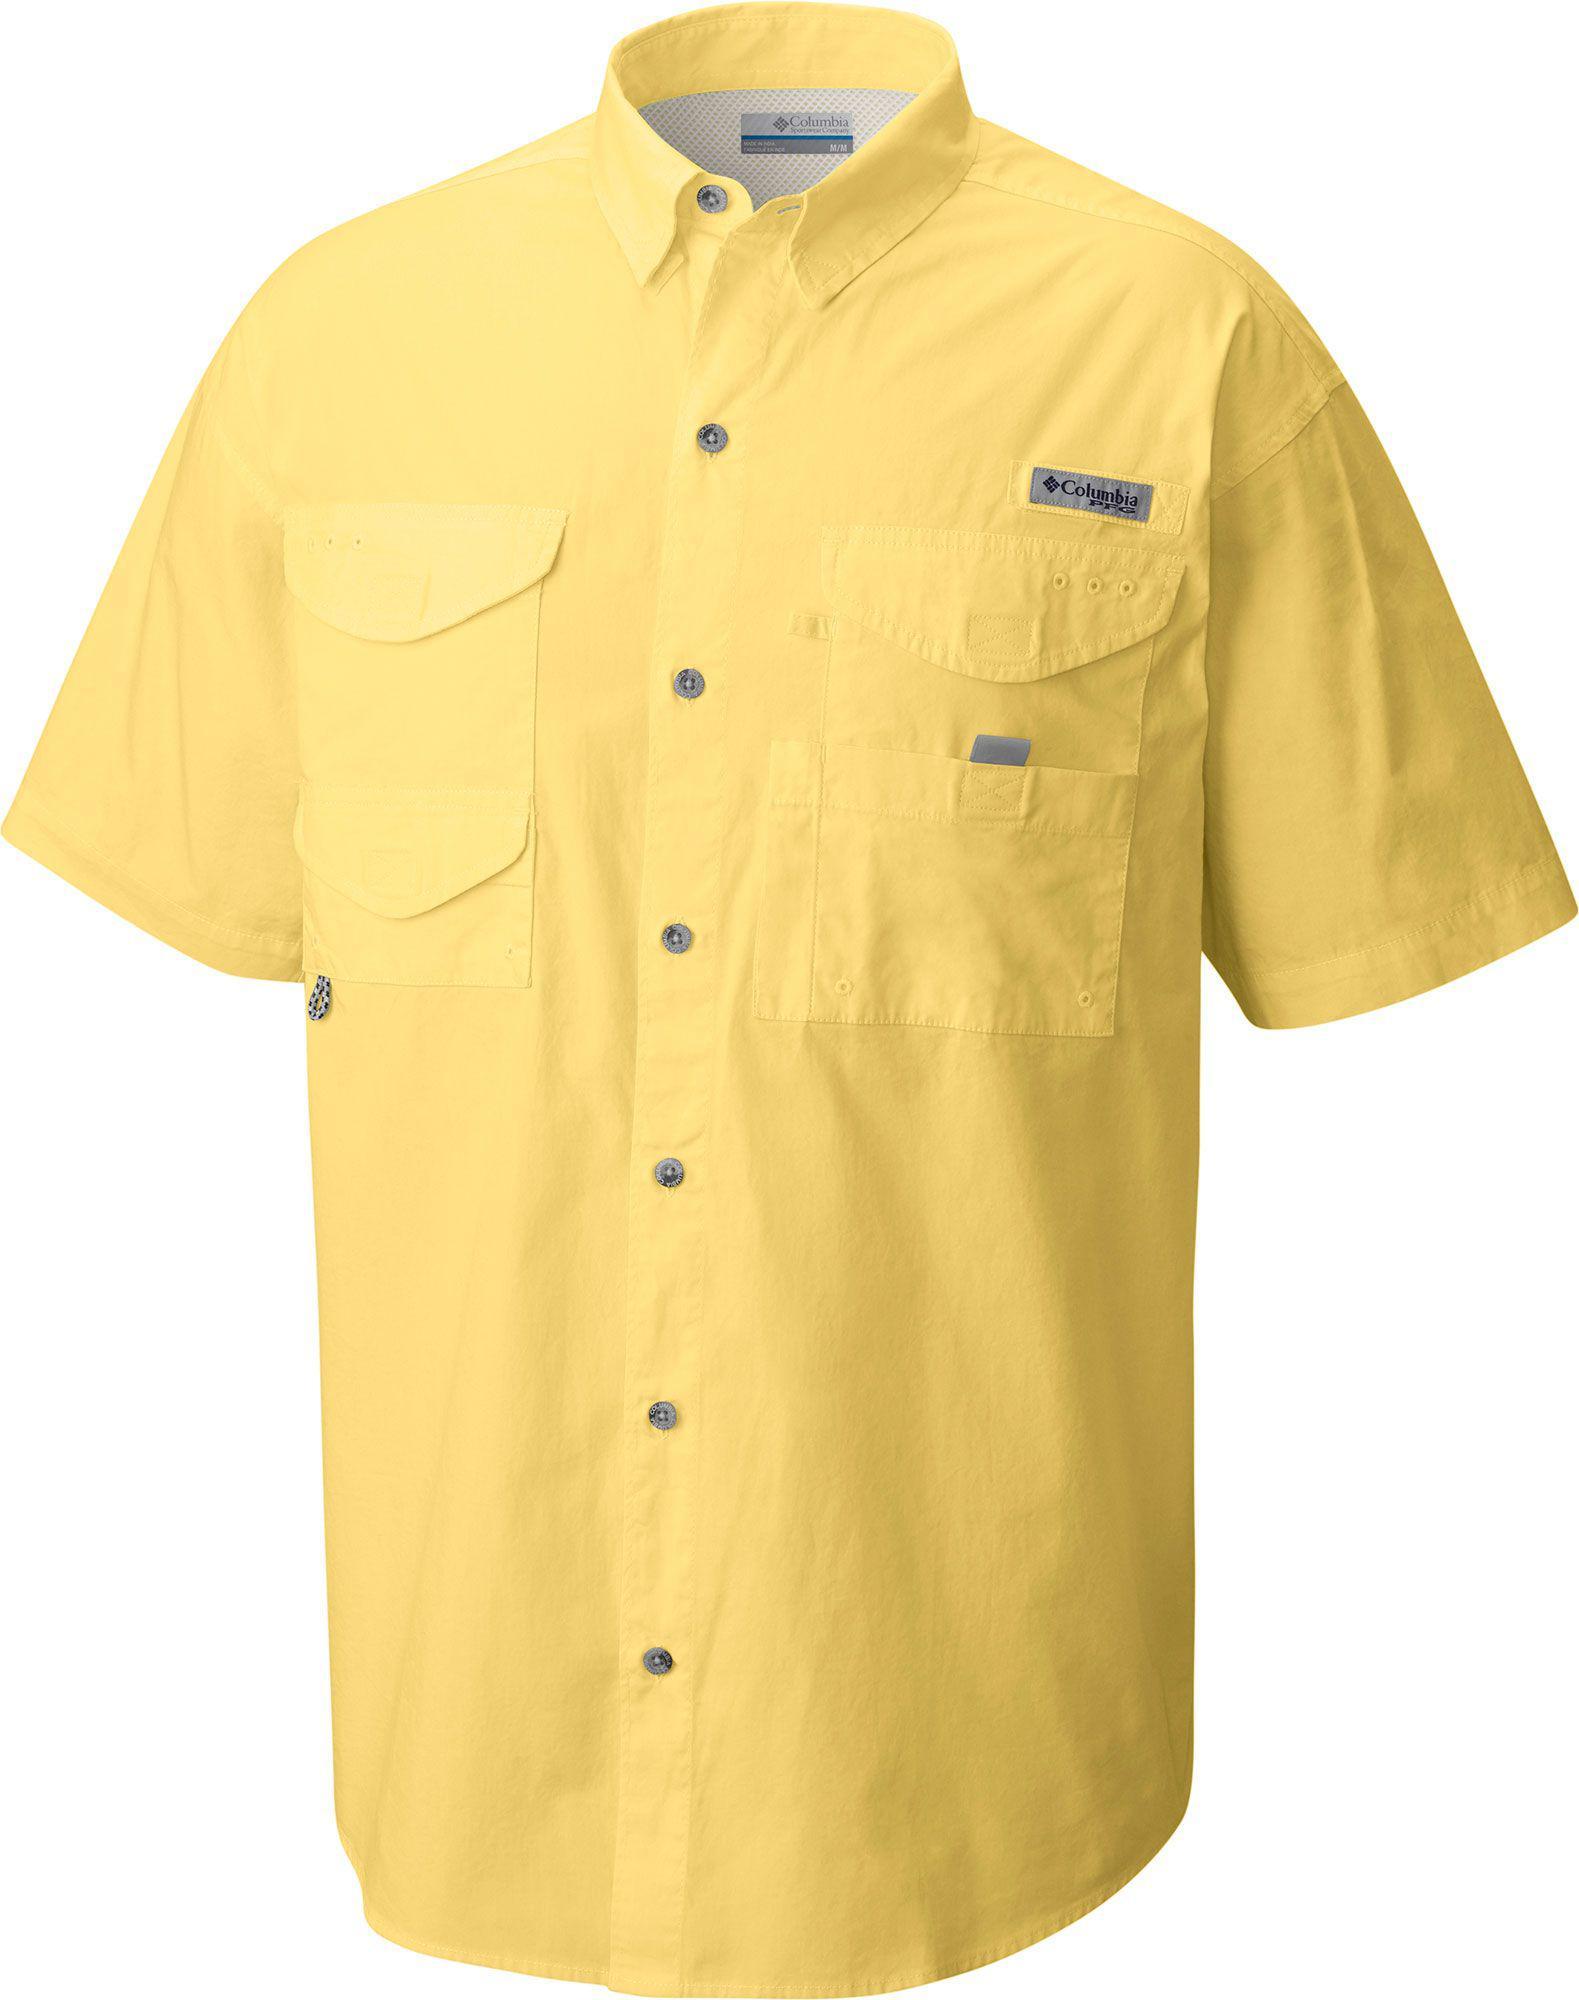 magellan angler fit shirt - HD1579×2000